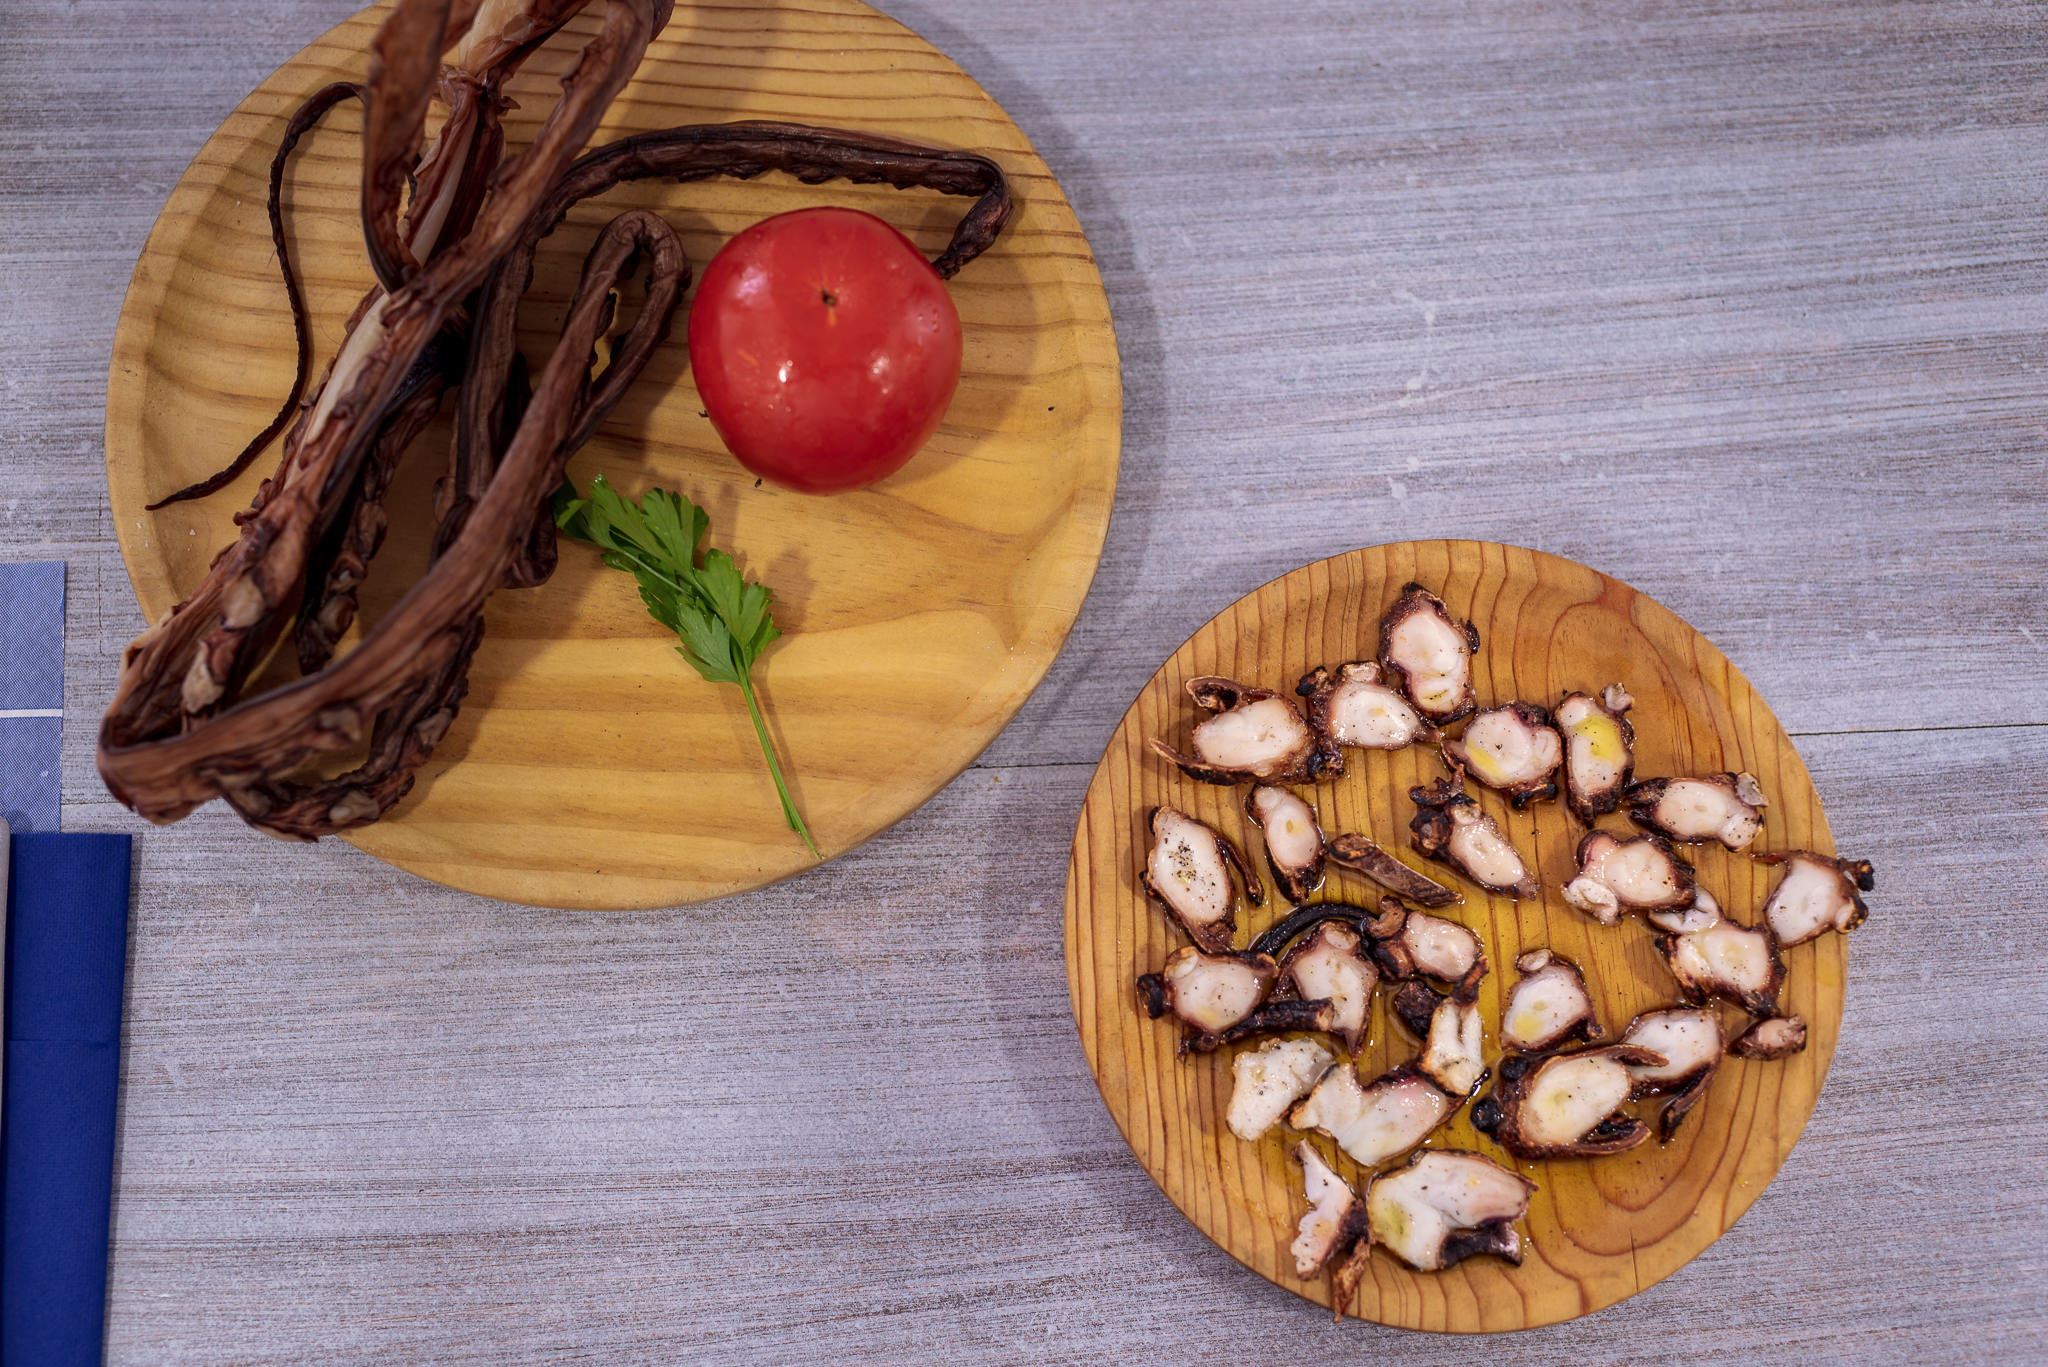 Chef Amadeo 076 - 25325